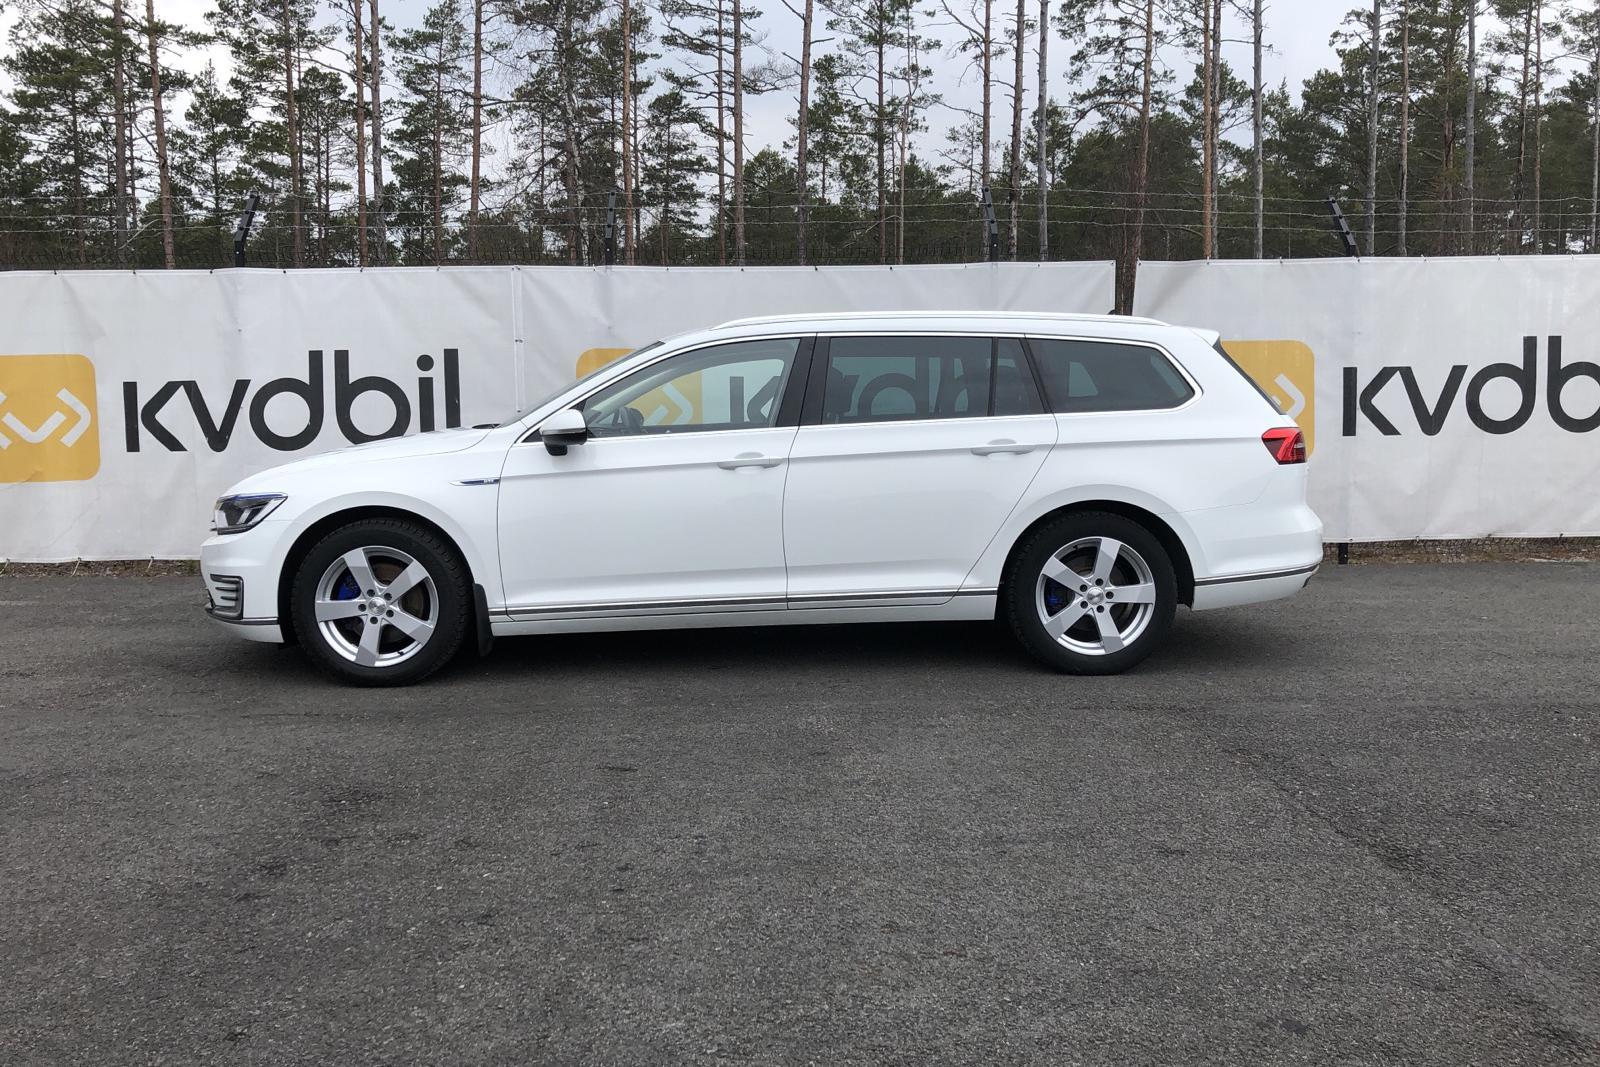 VW Passat 1.4 Plug-in-Hybrid Sportscombi (218hk) - 9 546 mil - Automat - vit - 2017